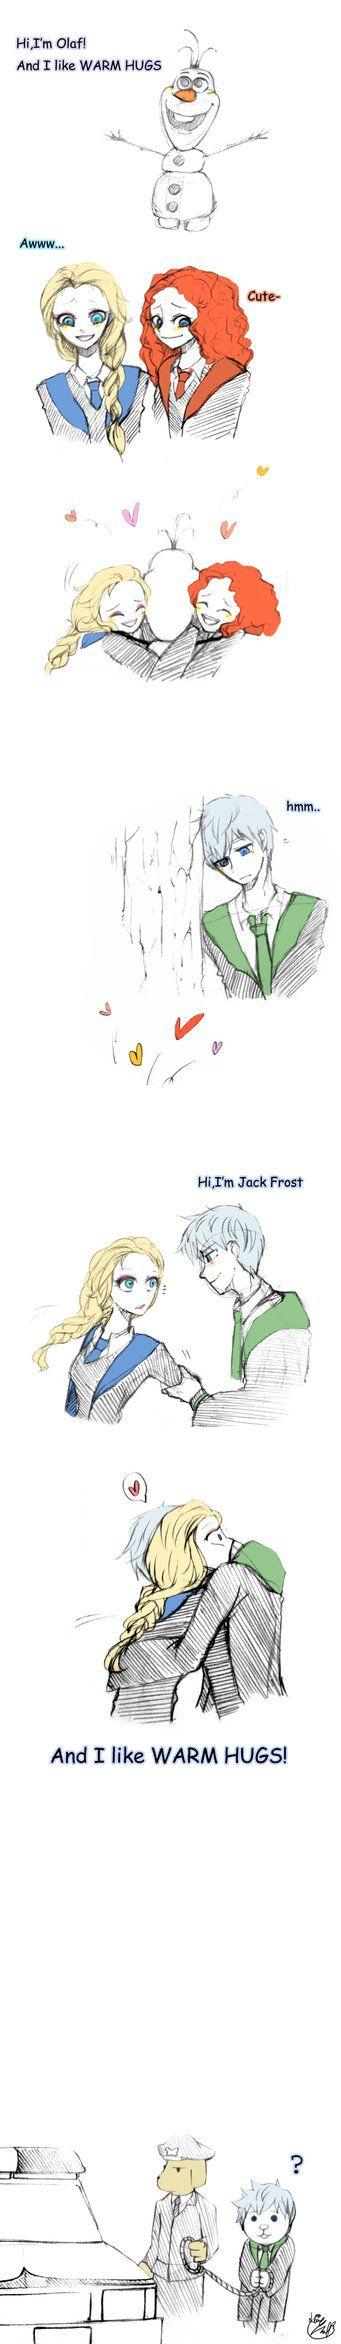 Warm hugs by Lime-Hael on deviantART